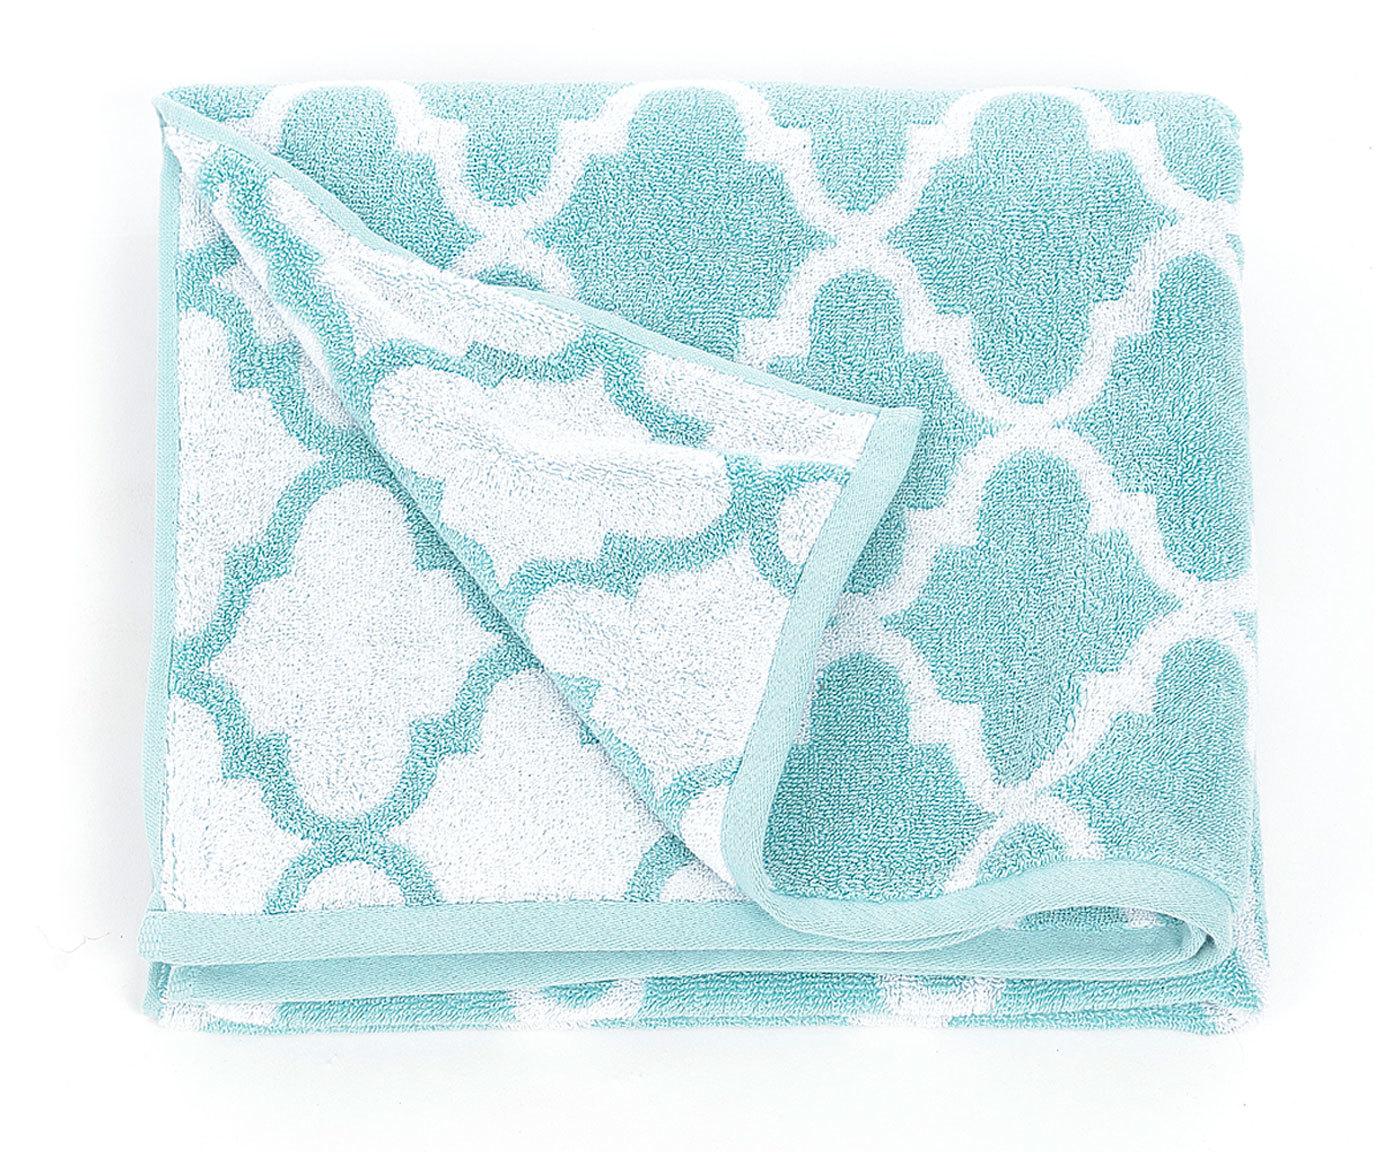 Двухсторонее полотенце MediterraneanБанные полотенца<br><br><br>Material: Хлопок<br>Ширина см: 160<br>Высота см: 1<br>Глубина см: 80